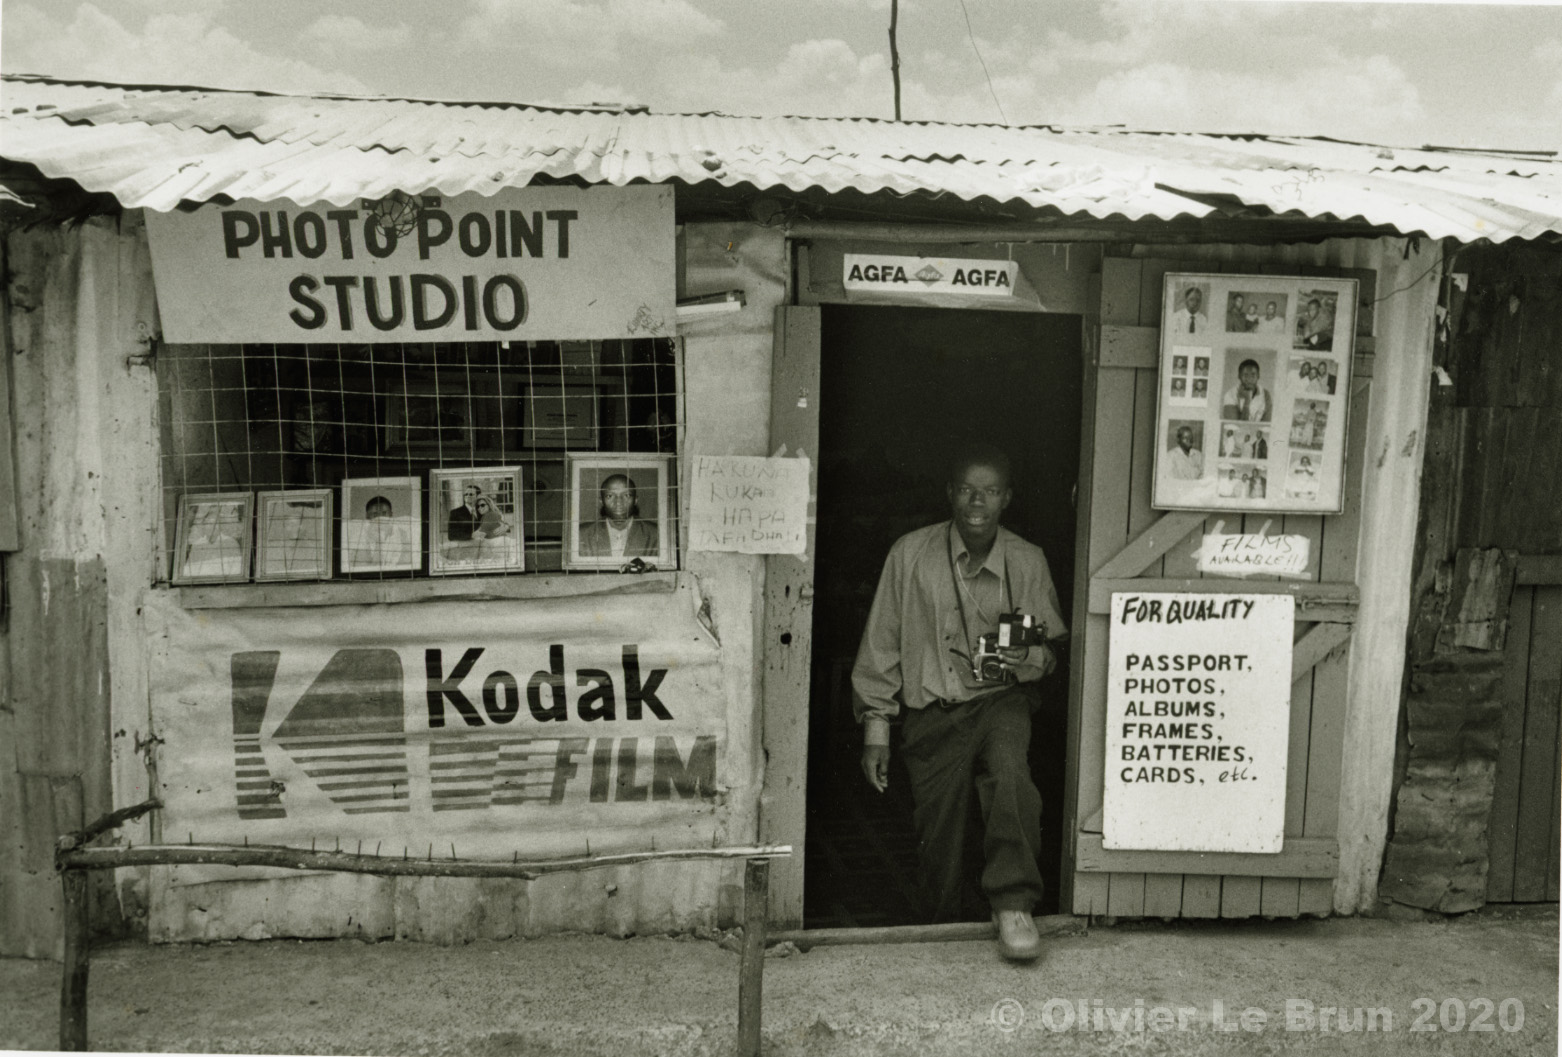 08 studios photo Nairobi, Kenya, 2007